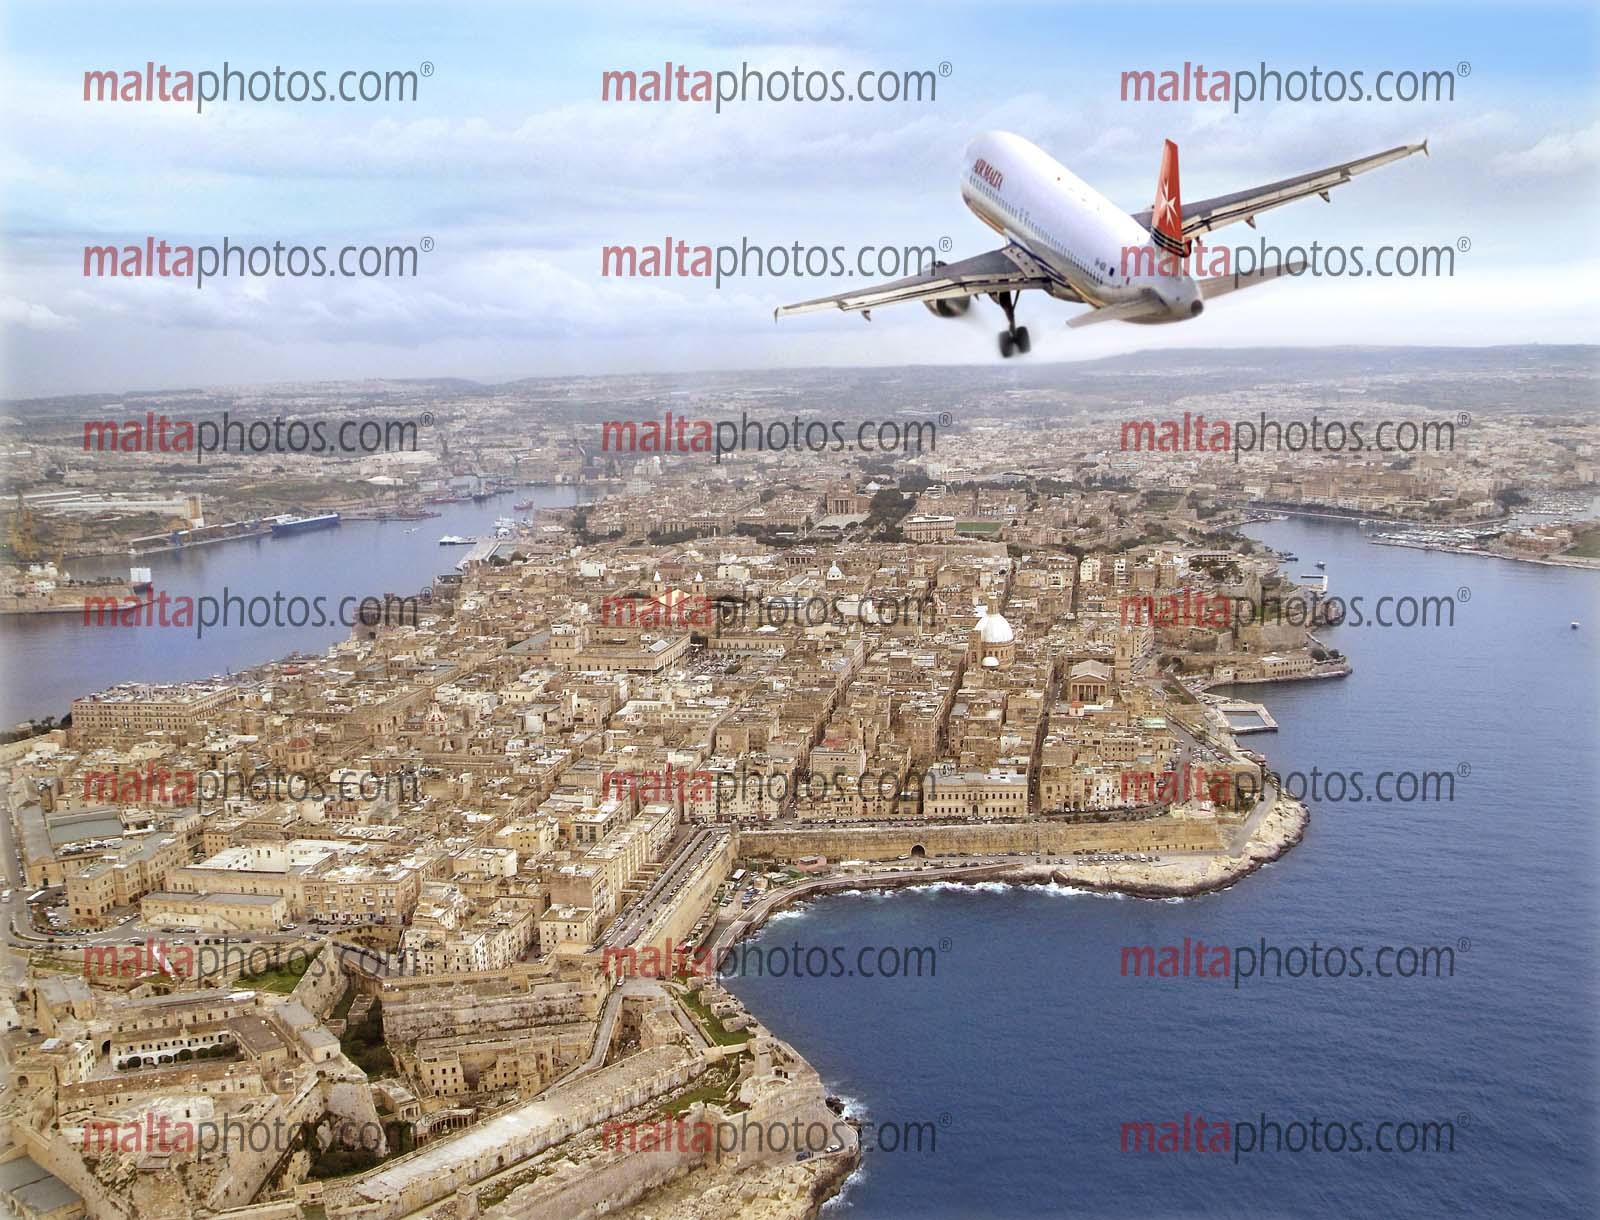 Valletta Aerial National Airline Air Malta Malta Photos